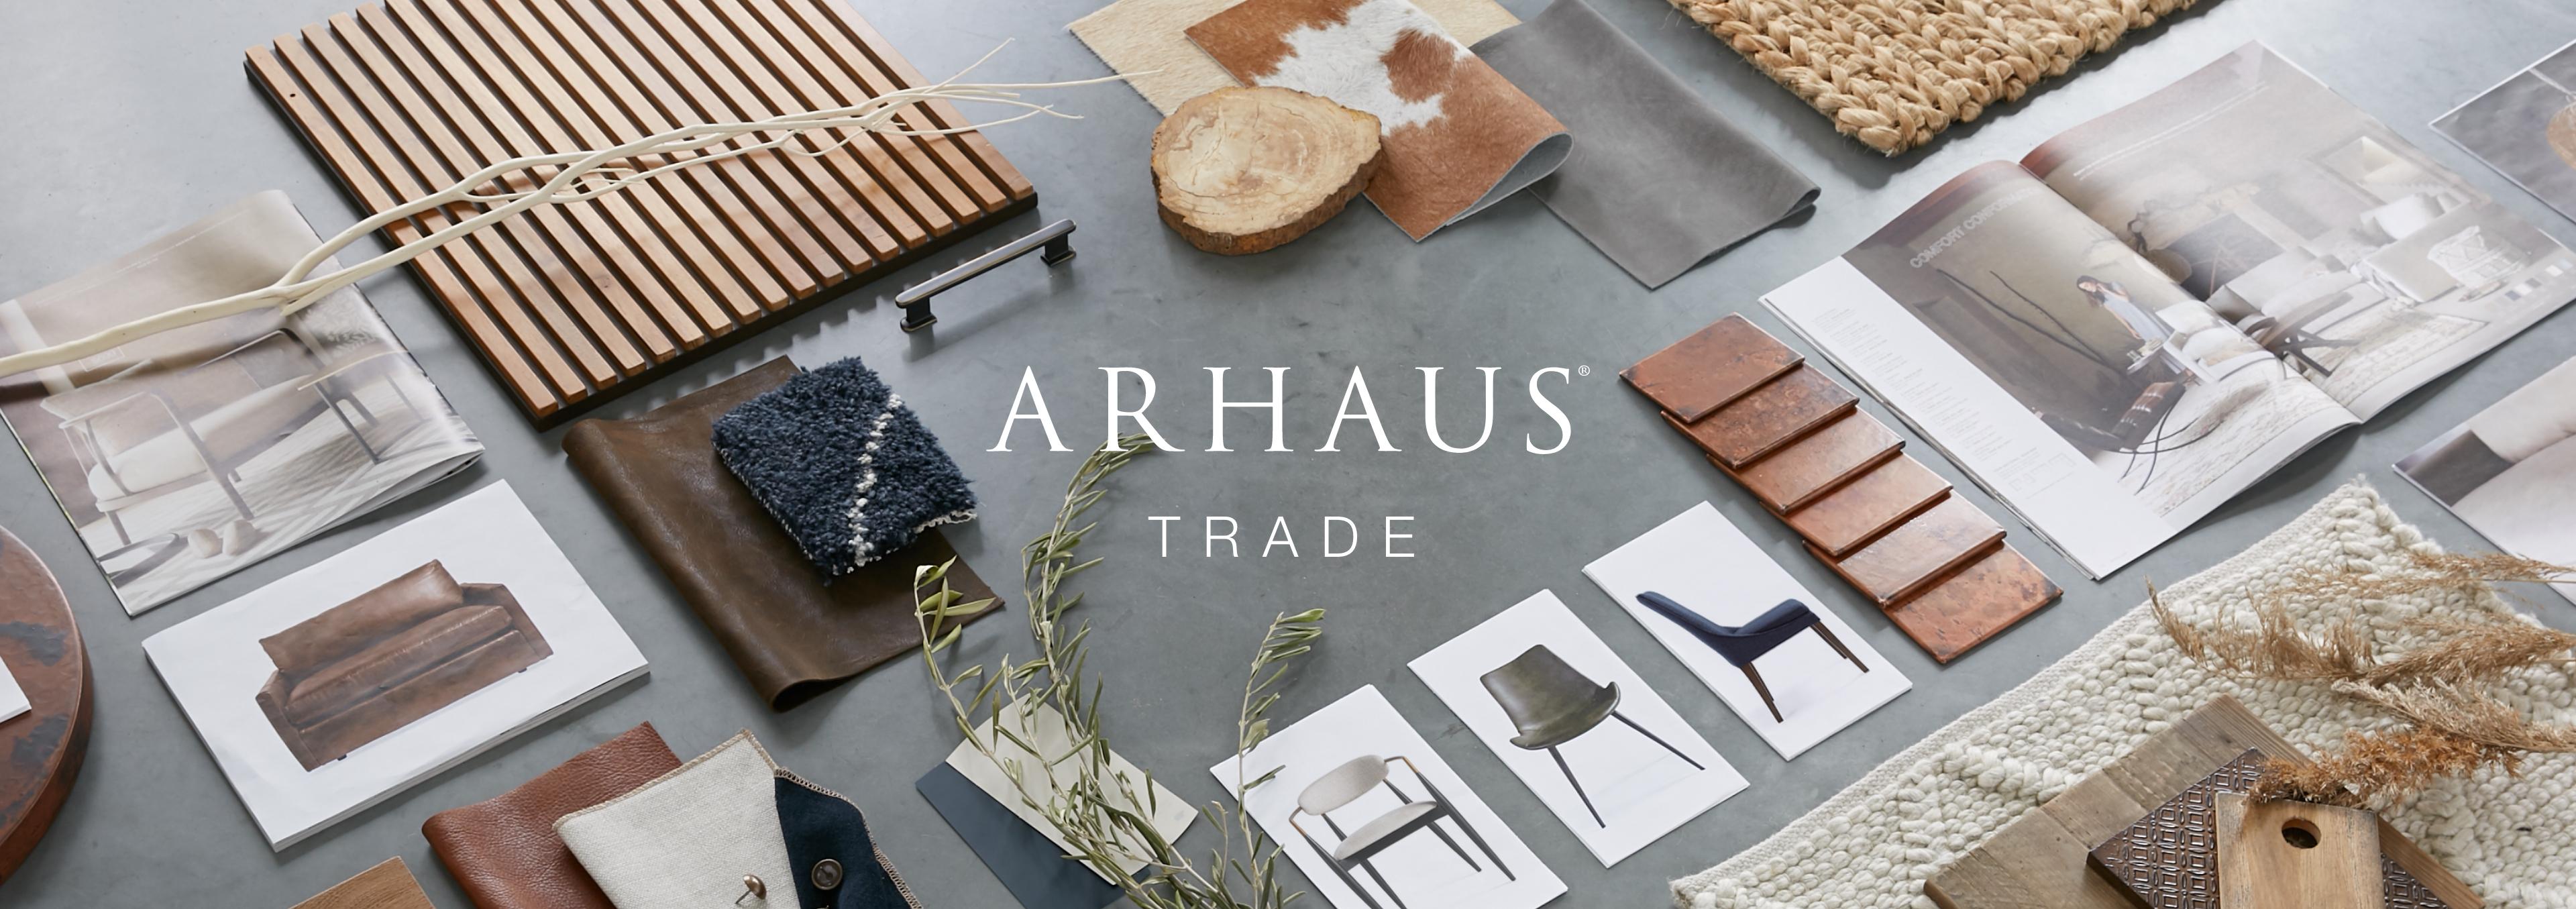 Arhaus Trade Services